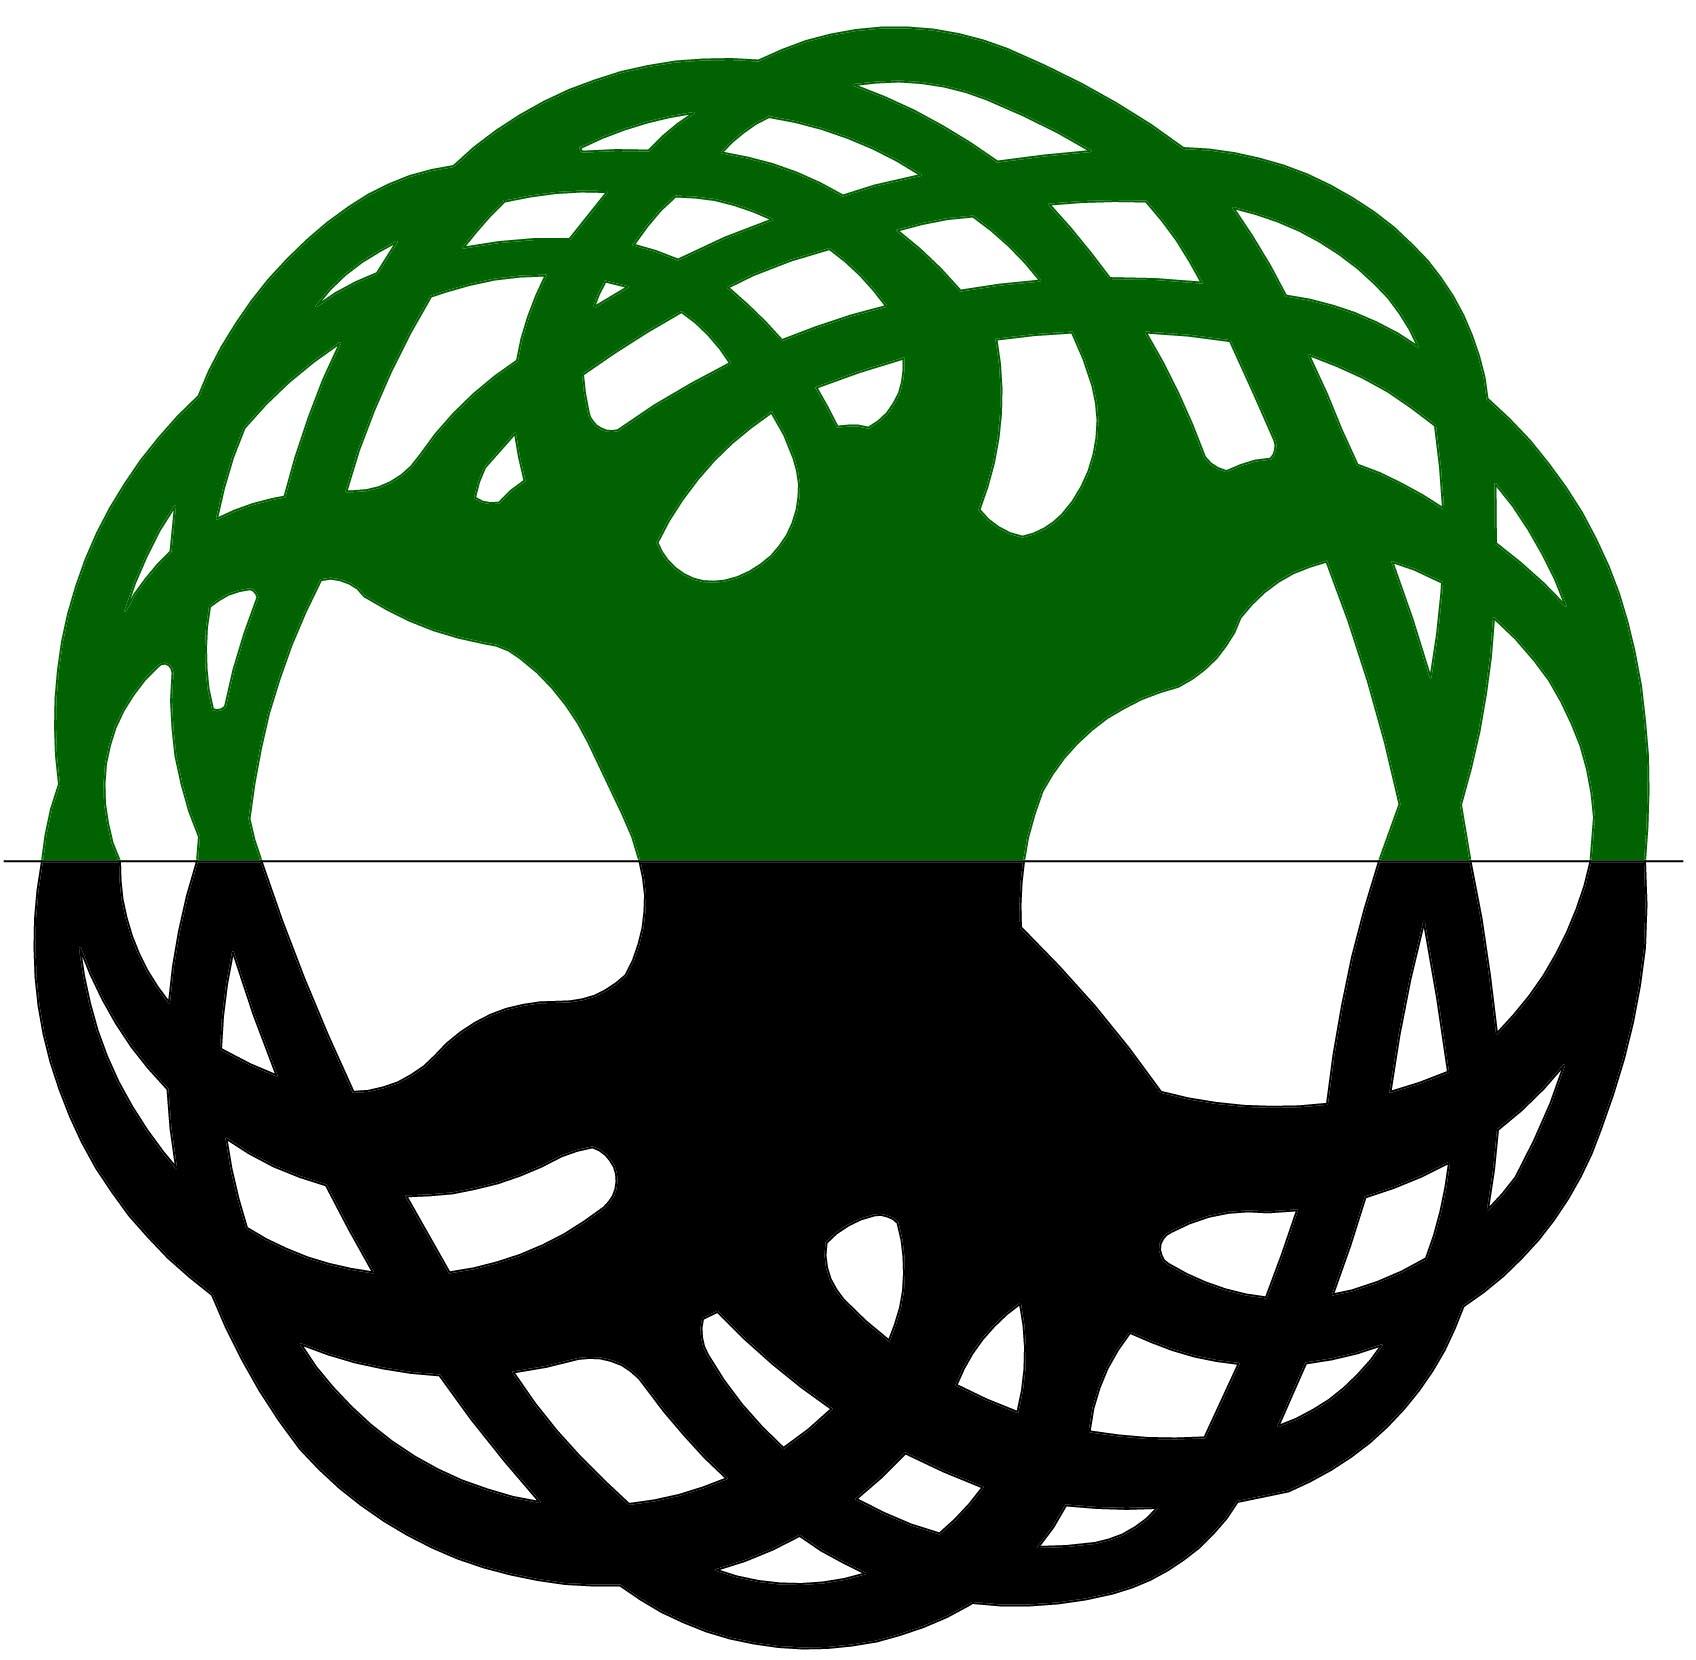 (D:\Gr374nRaum\Marketing\Homepage\Bilder\Logo-Gr374nraum-